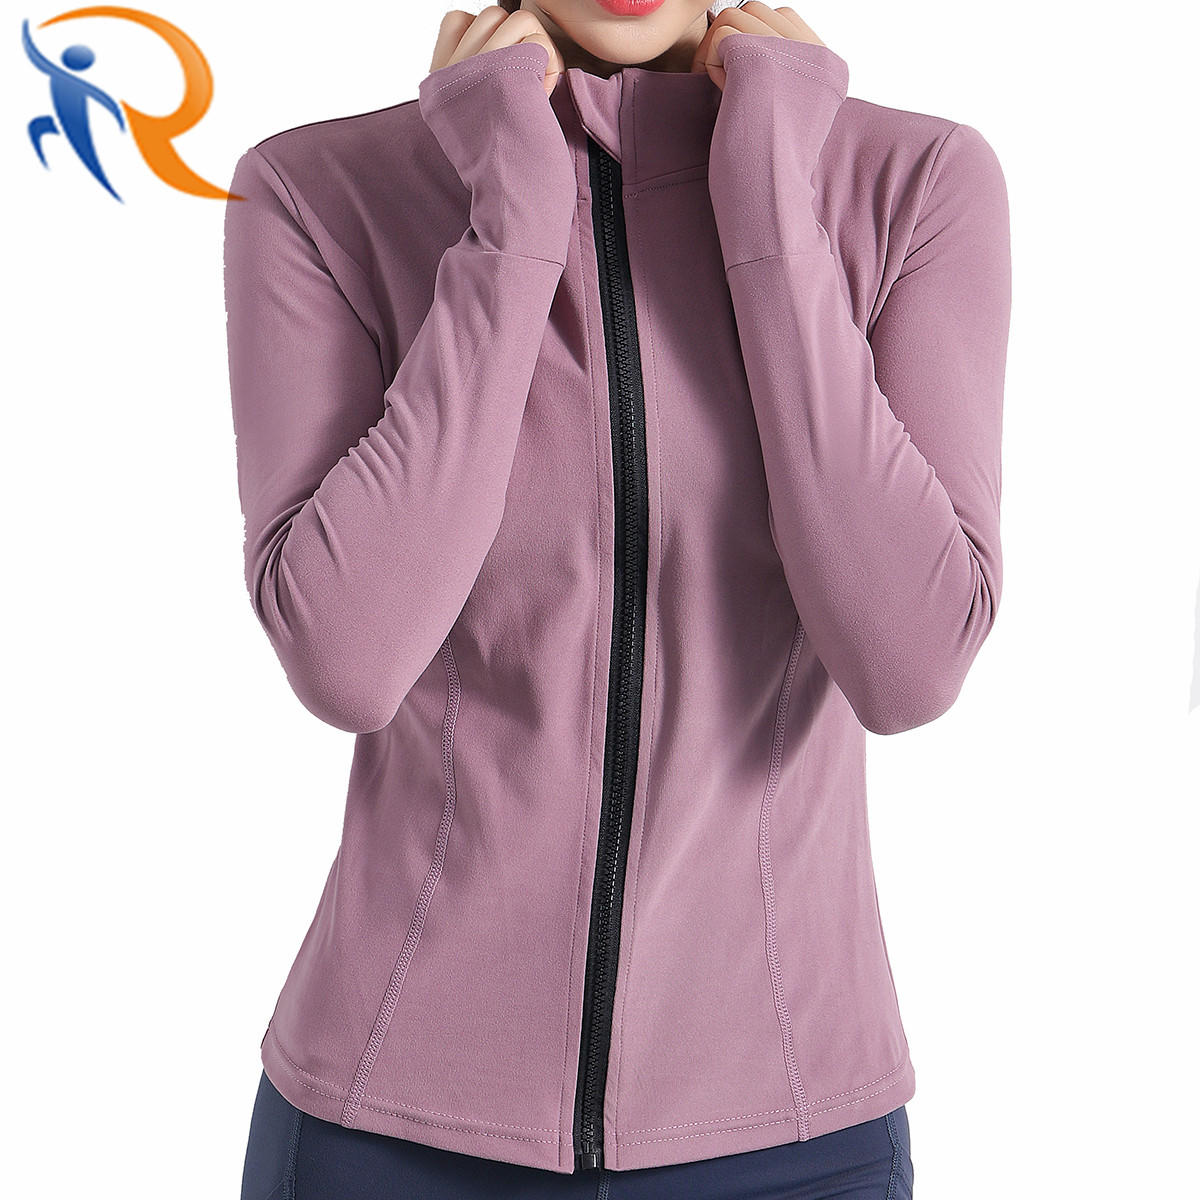 Women Slim Zip up Yoga Jacket Sports Tracksuits